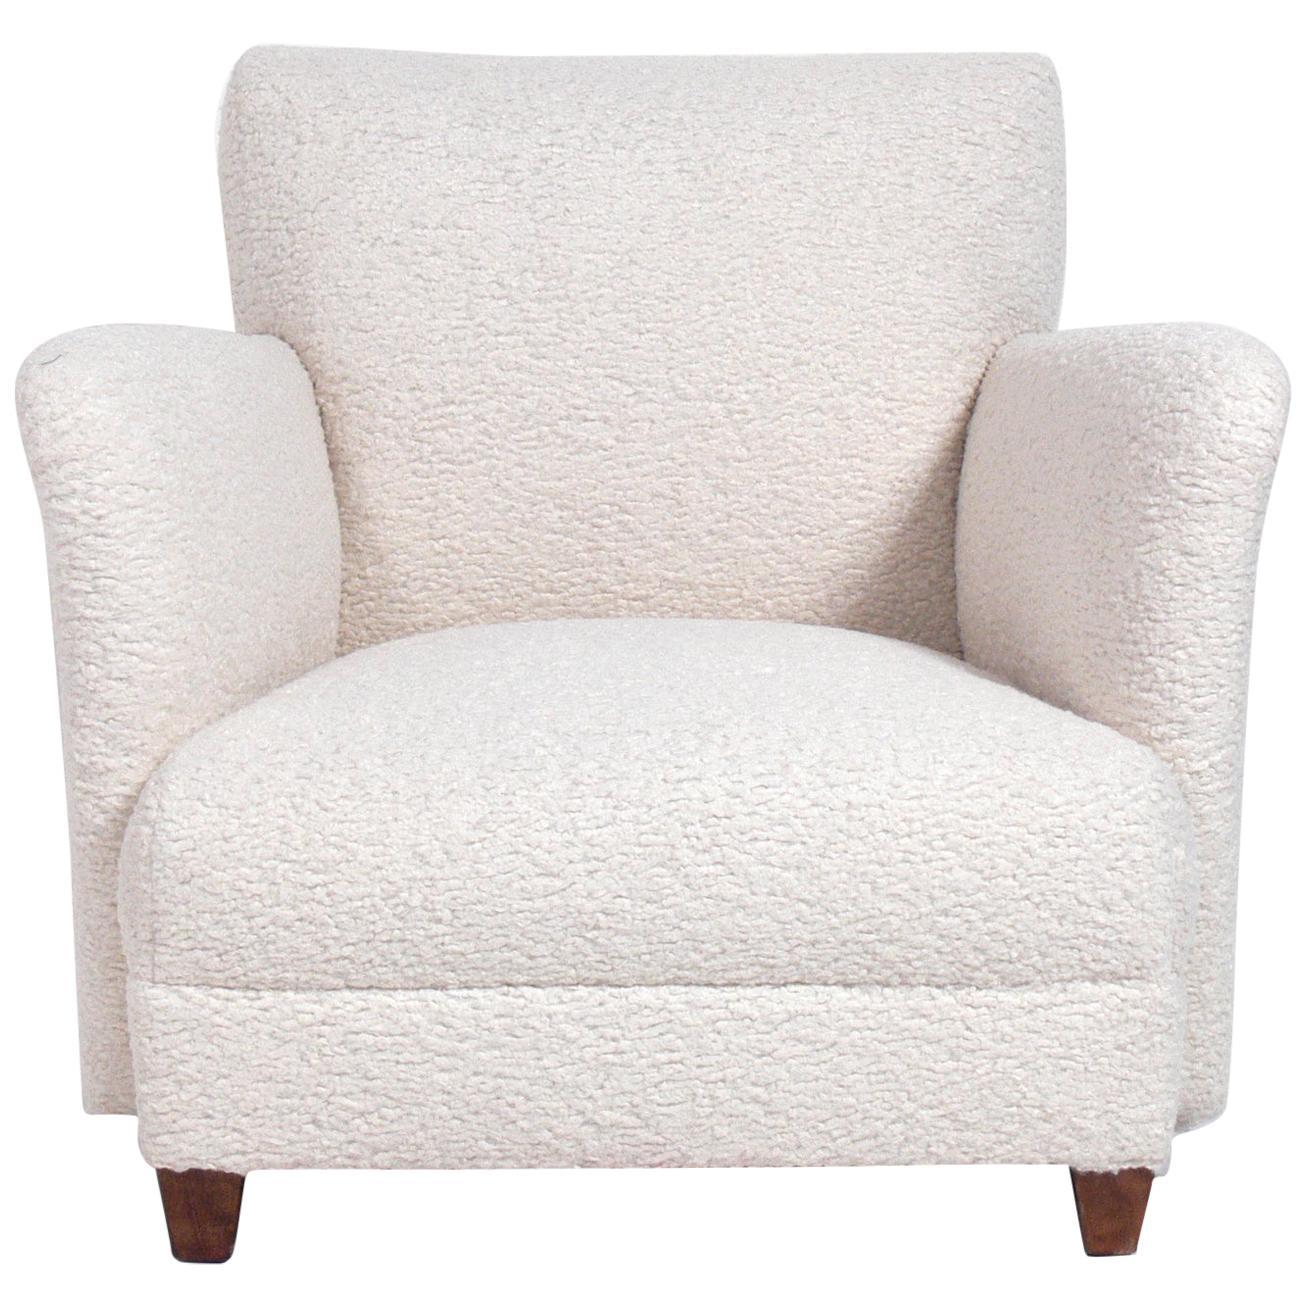 Curvaceous Danish Modern Lounge Chair in Faux Sheepskin